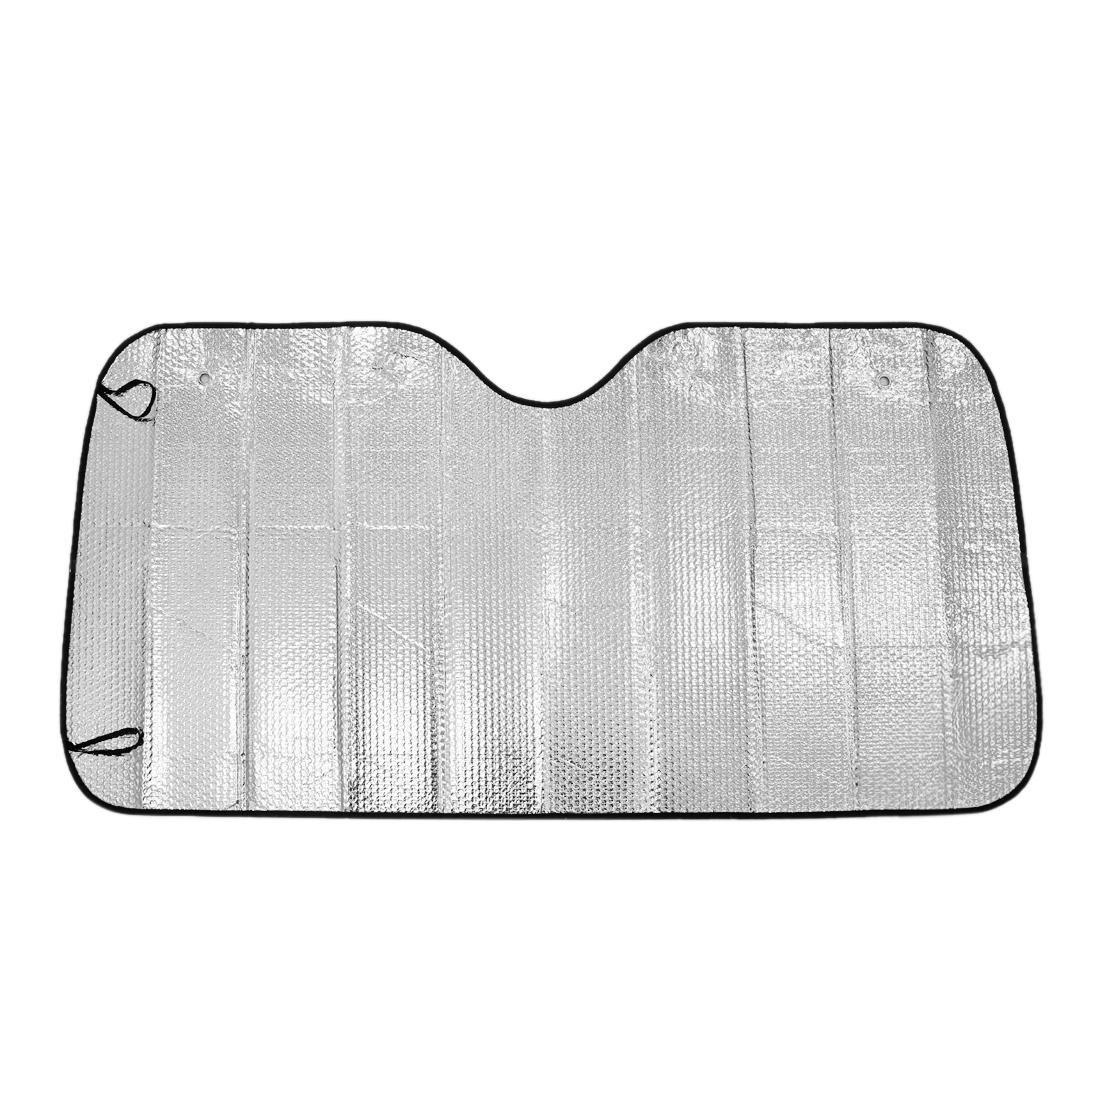 Black Silver Tone Car Windshield Sunshade Shield Front Rear Wind Foldable Kit